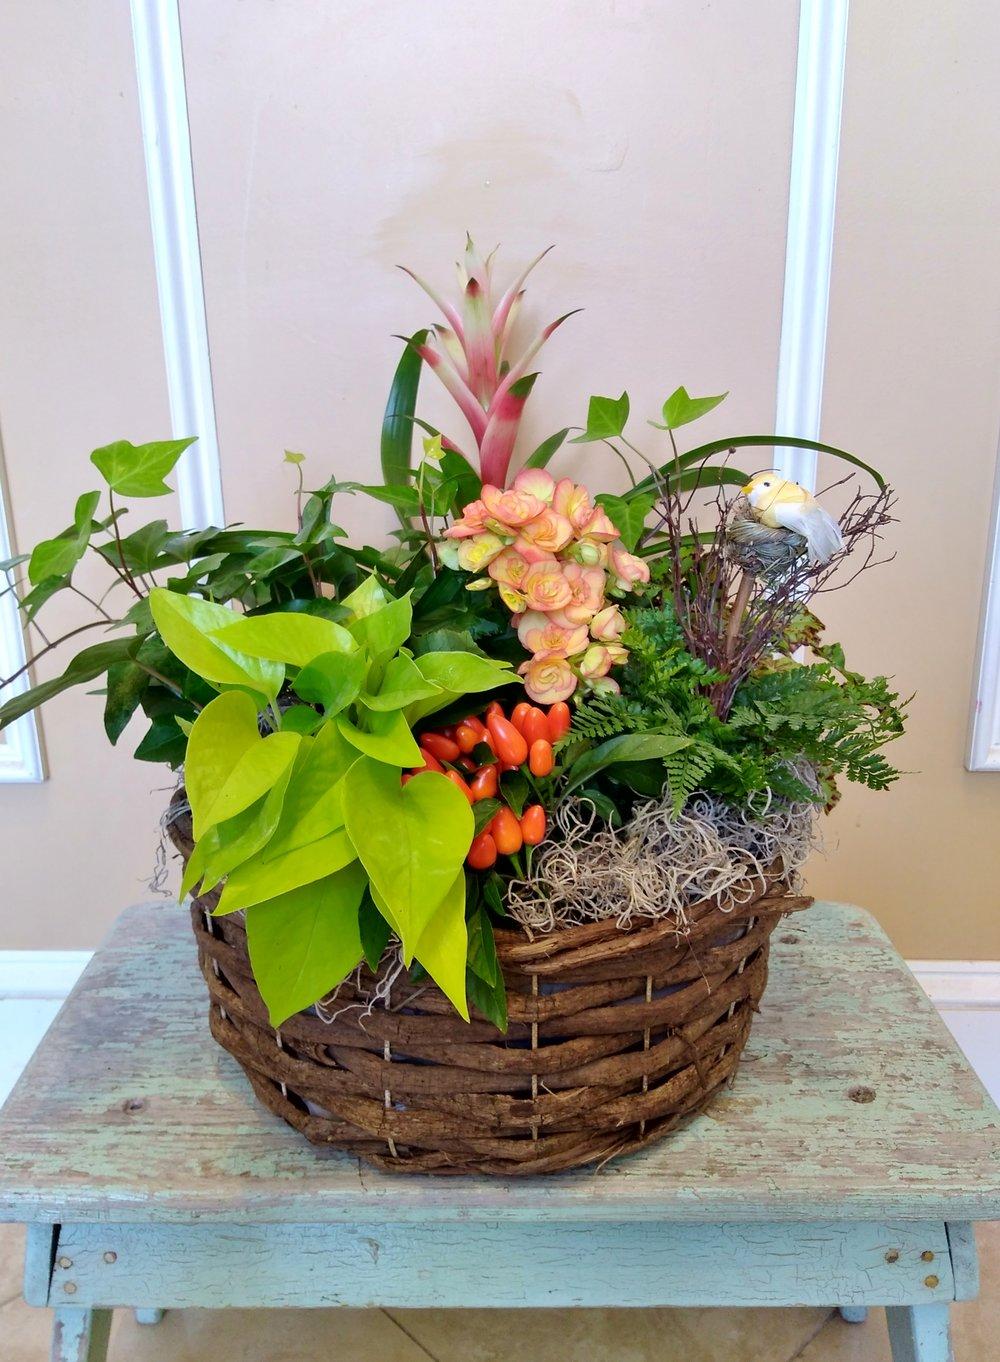 C2 $60-$125 European plant basket. $60 as shown.